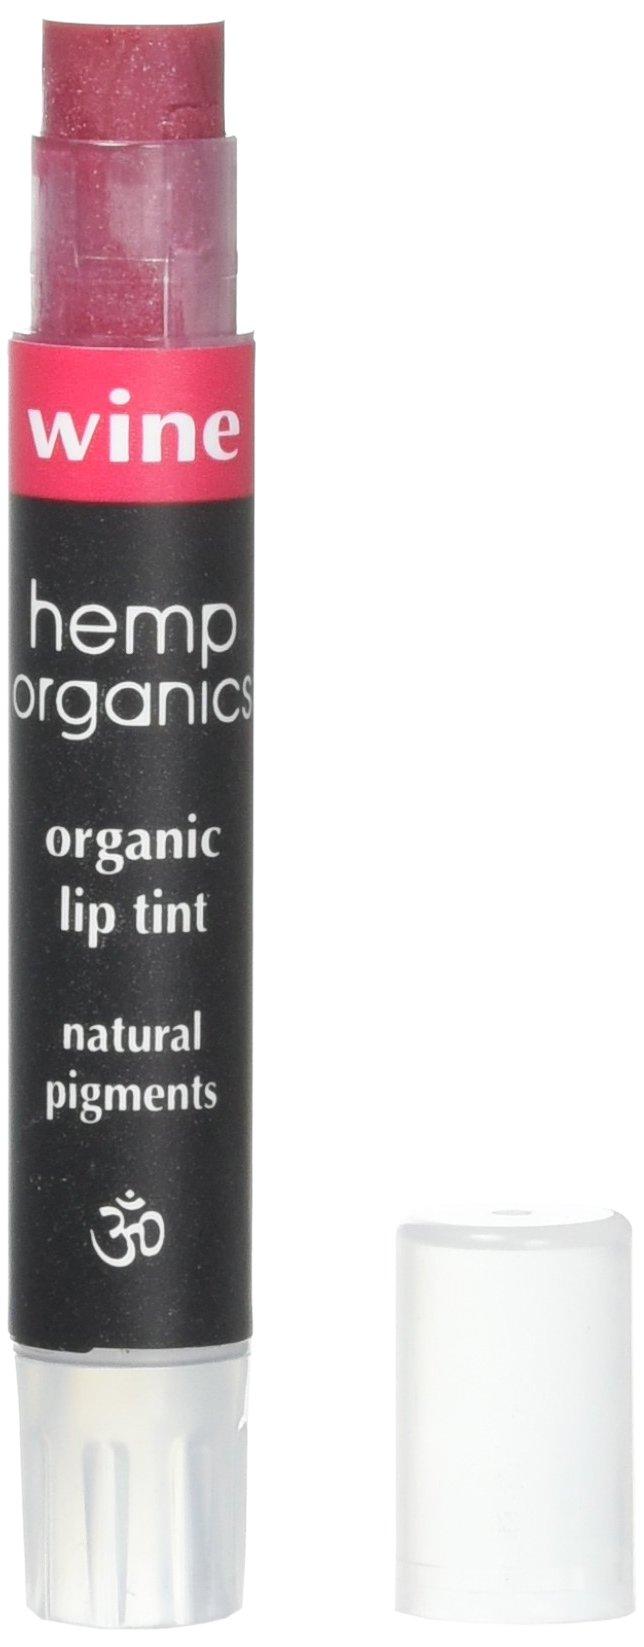 Colorganics Hemp Organics Wine Lip Tint 2.5 Gram Stick